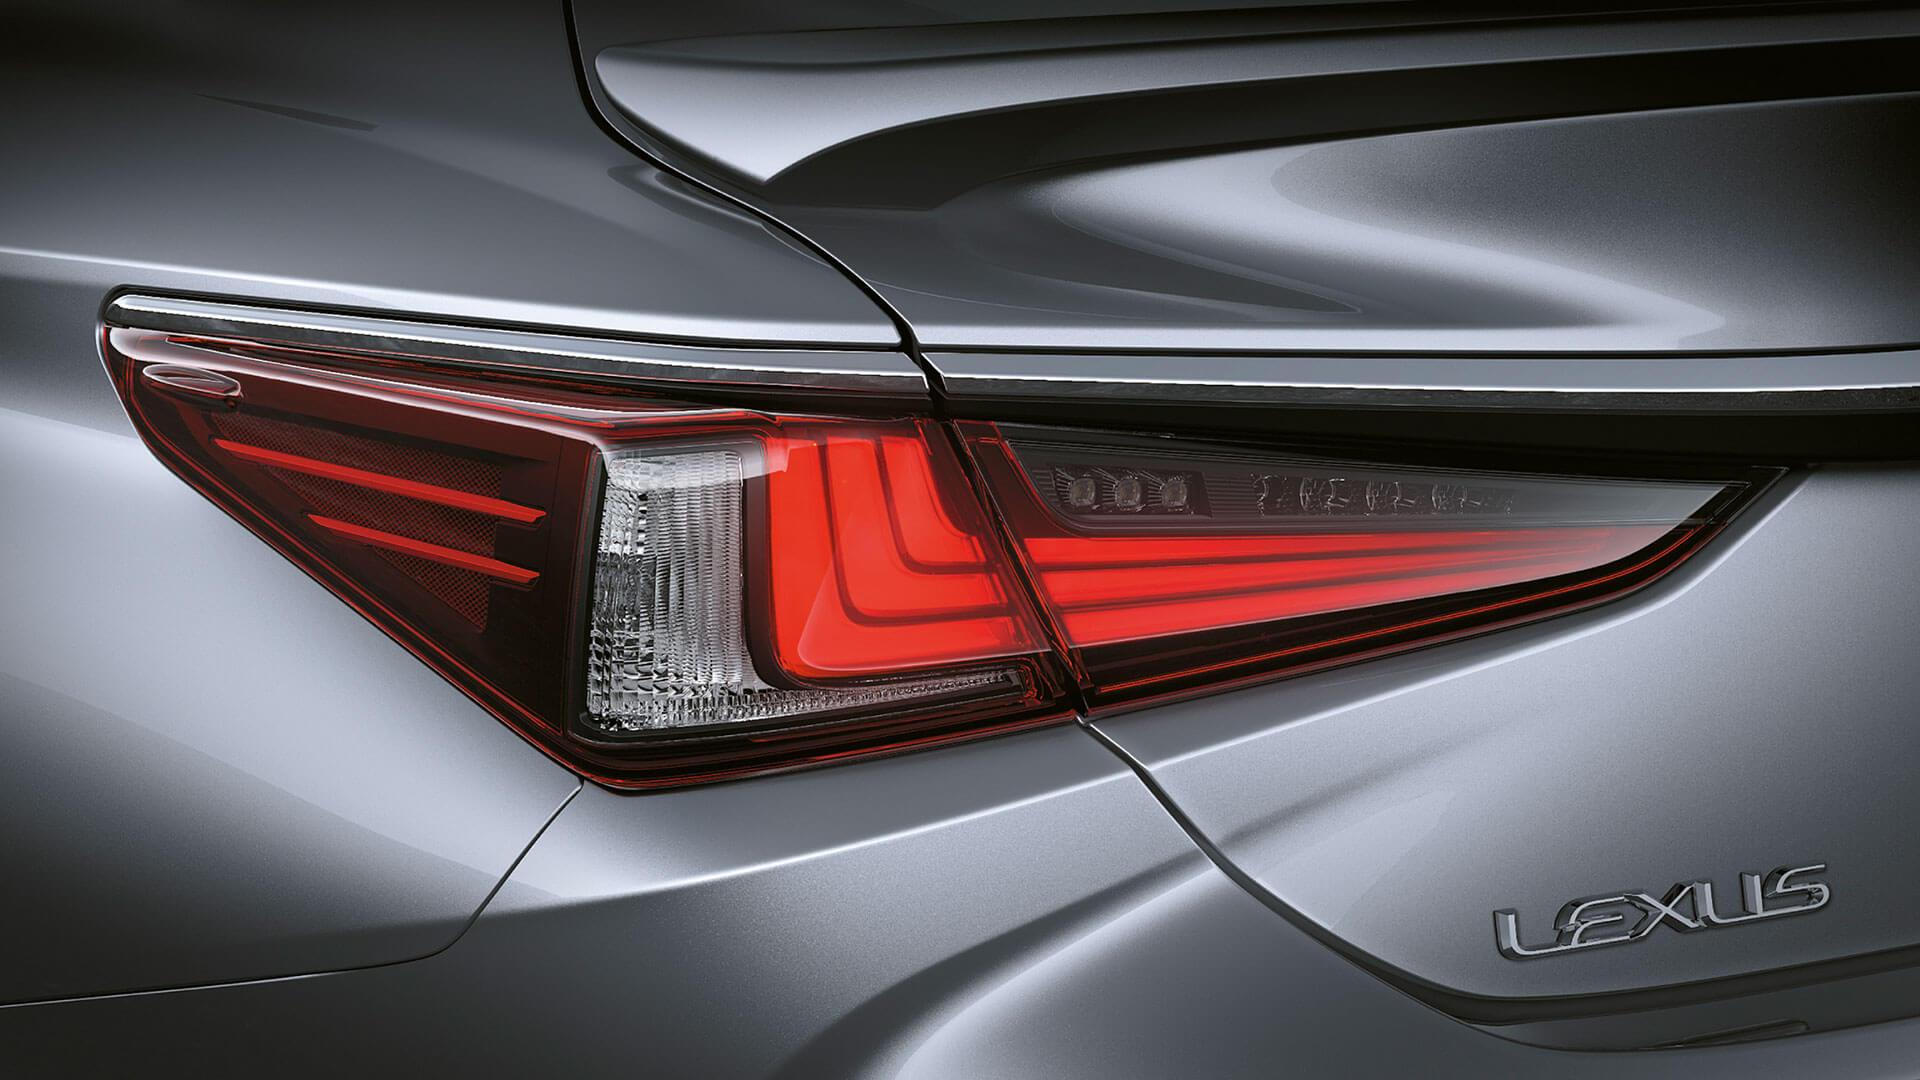 2019 lexus es 250 experience feature rear led lights